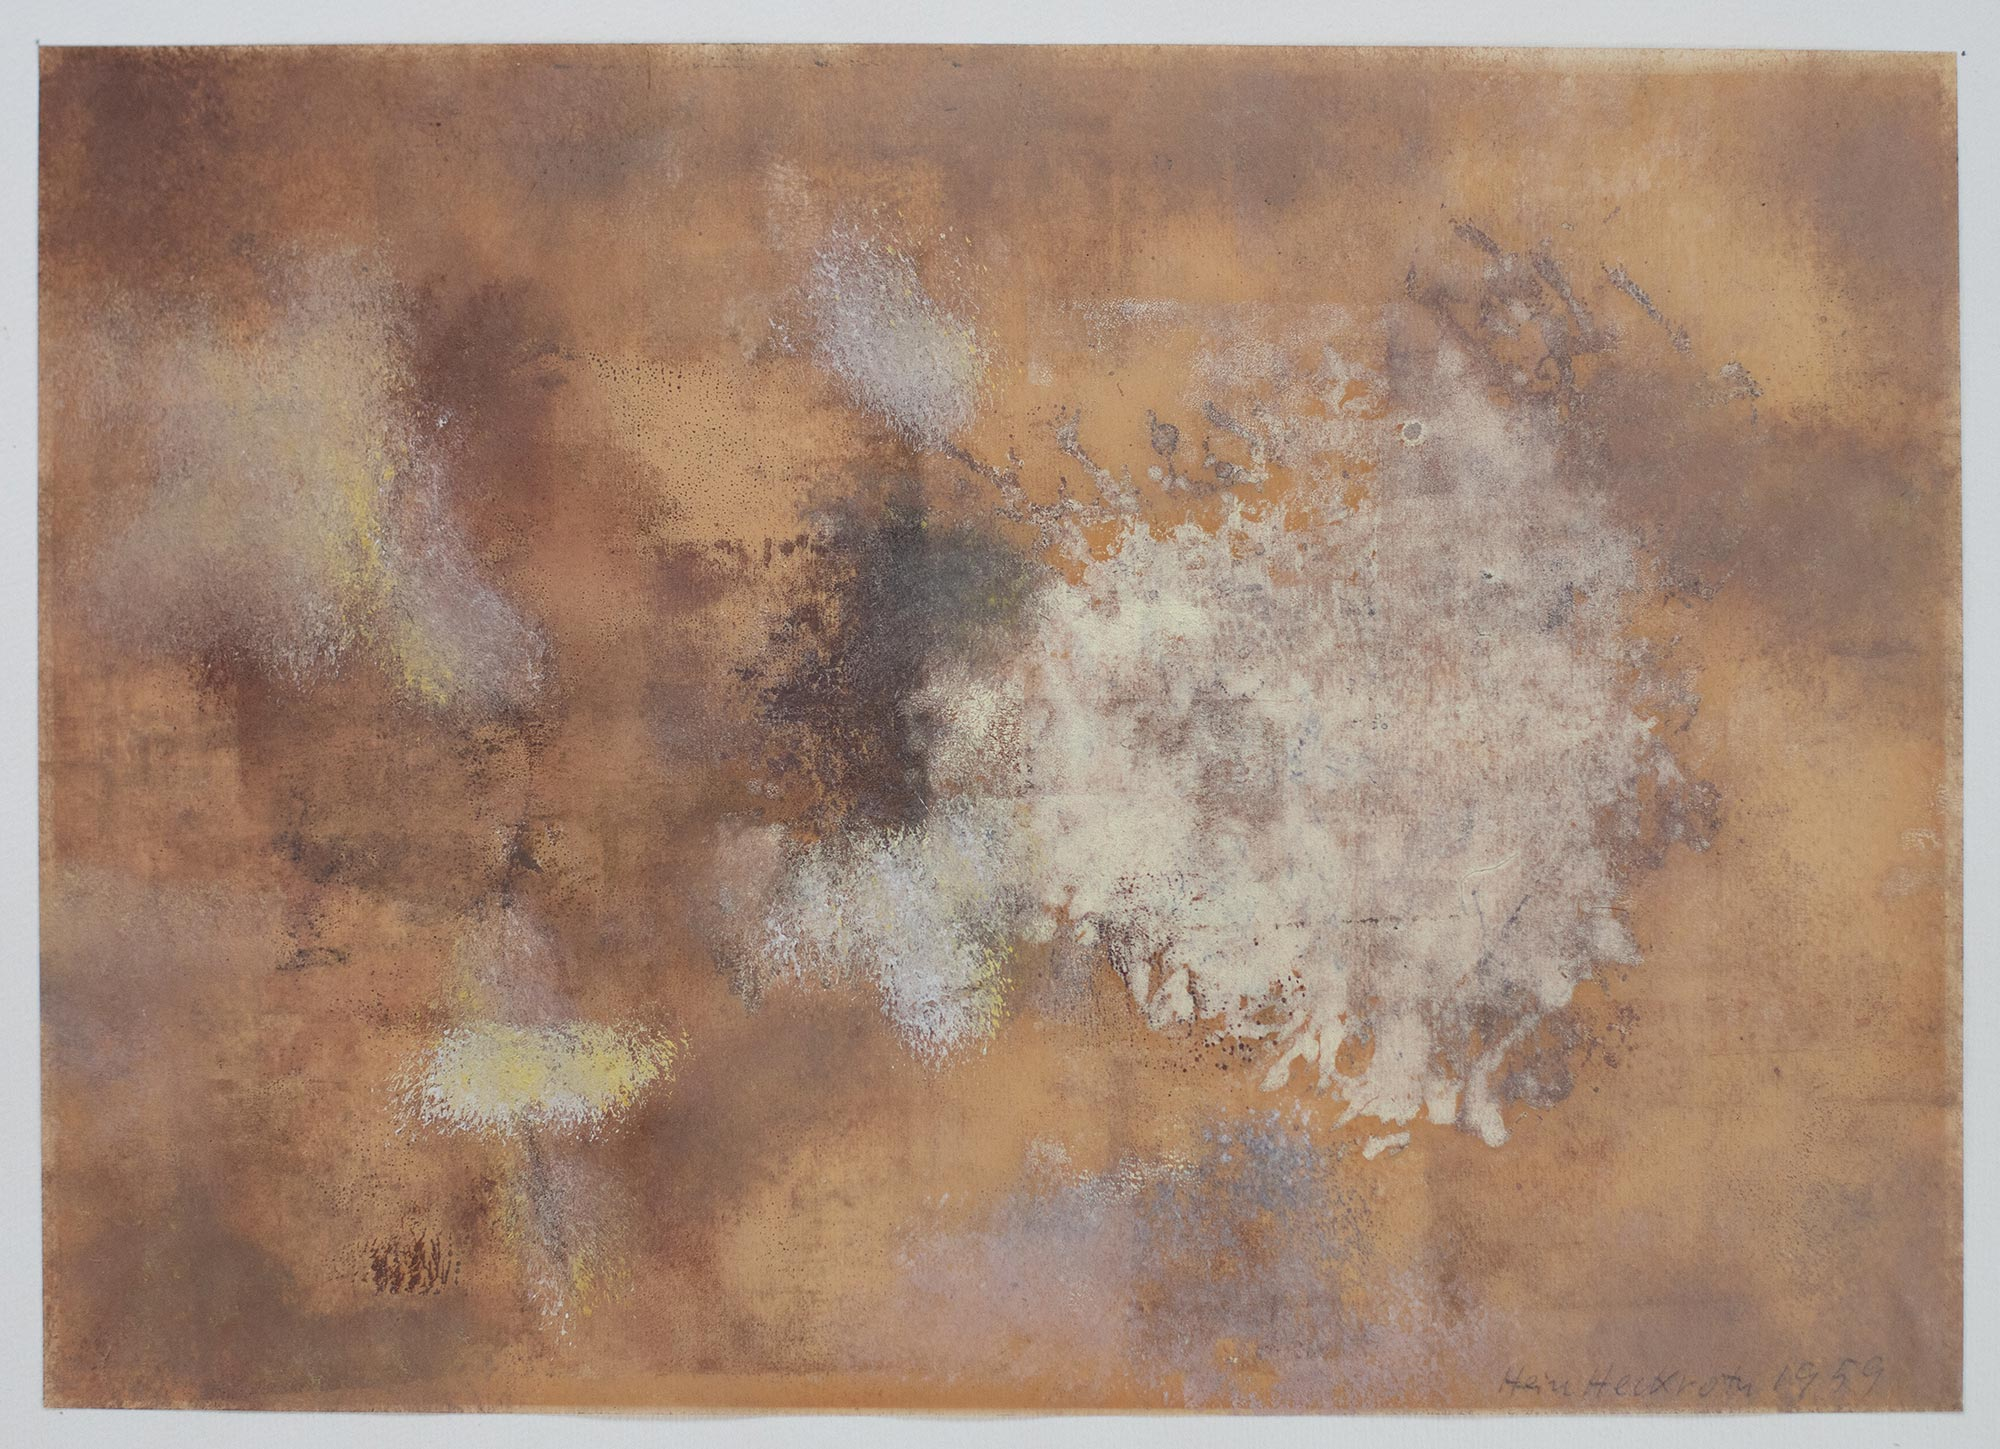 4 Hein Heckroth, o. T., 1959, Gouache, 43,5 × 55 cm, Privatbesitz